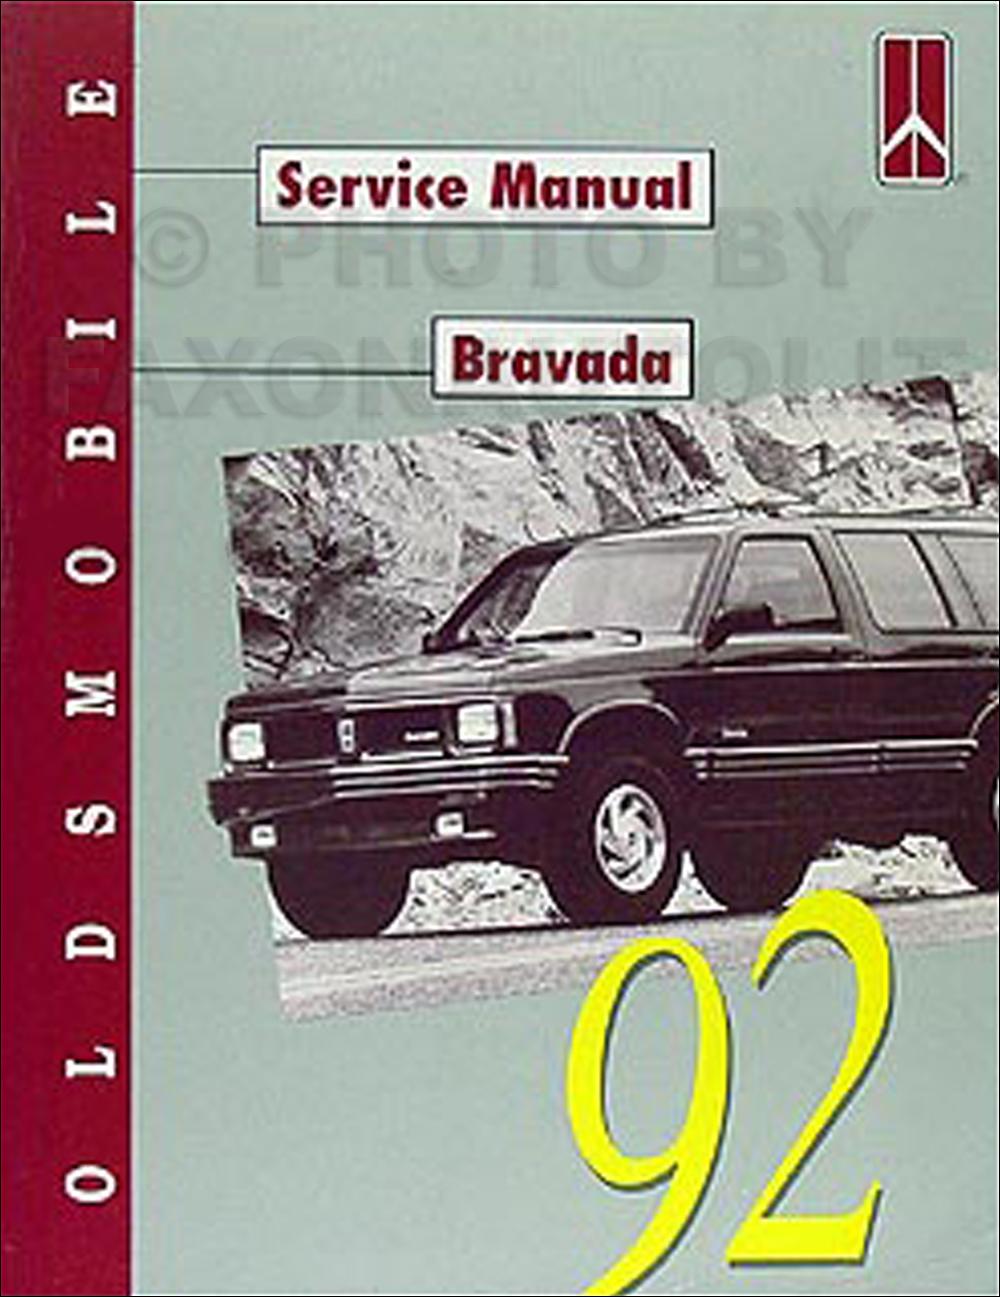 1997 oldsmobile bravada service manual open source user manual u2022 rh dramatic varieties com 1999 Oldsmobile Bravada 2003 Oldsmobile Bravada